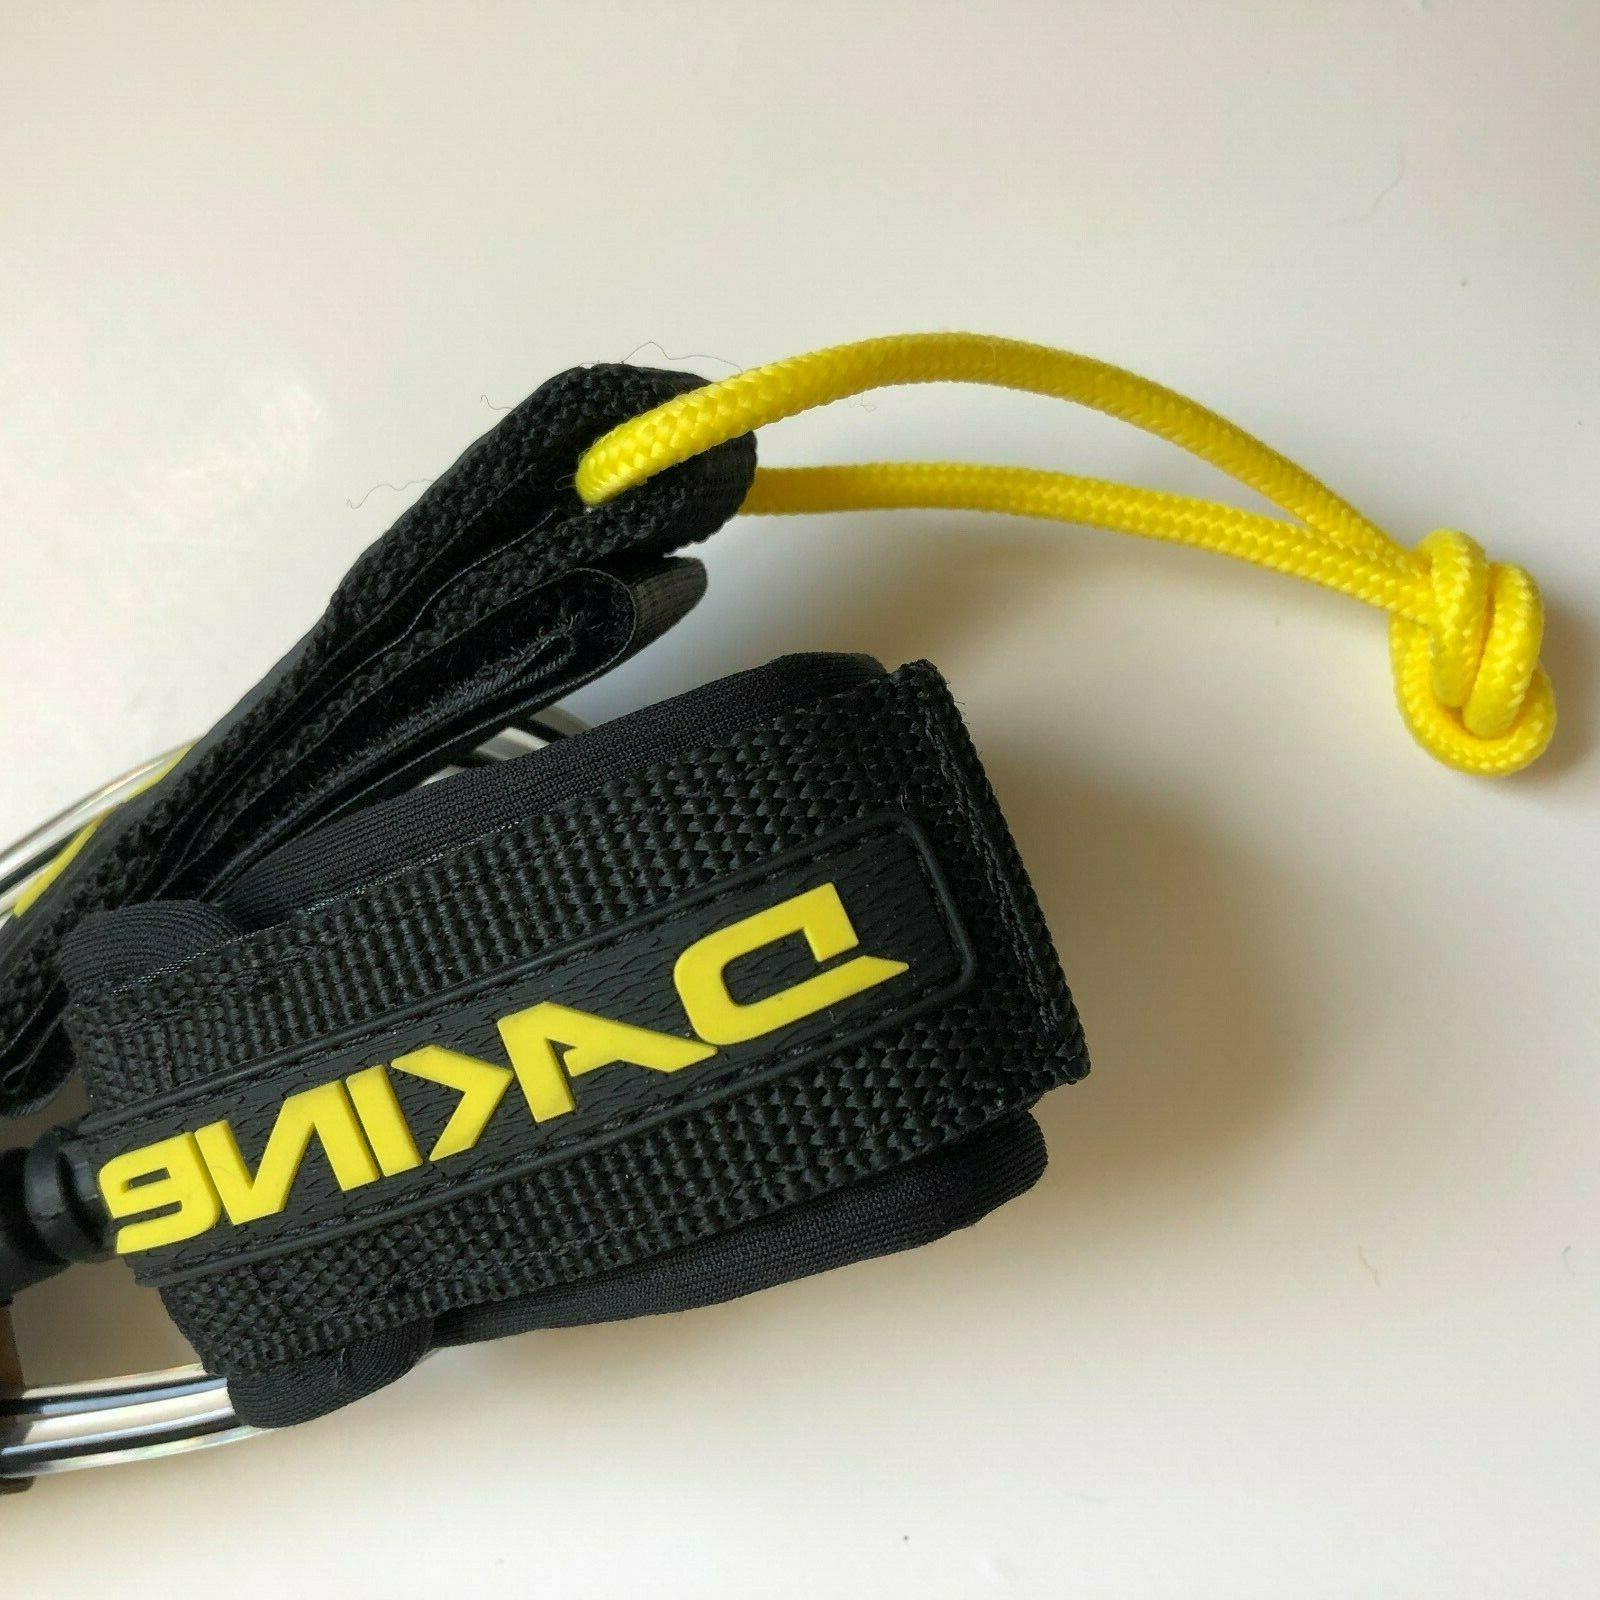 "Dakine Pro Comp 6' x 3/16"" Surf BLACK/CLEAR -BRAND NEW FREE SHIP"